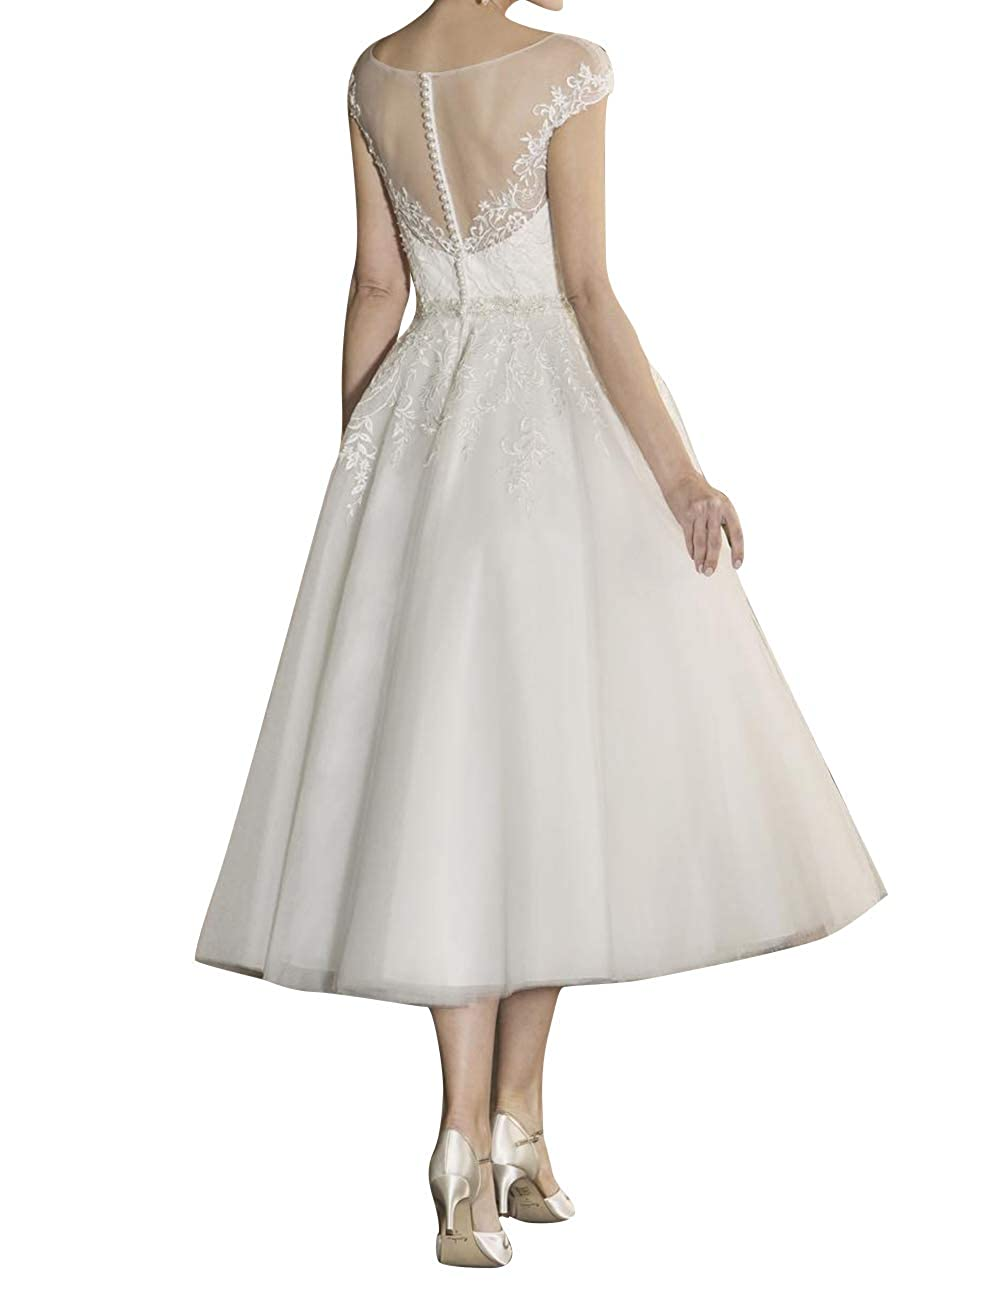 Wedding Dresses Short Bridal Gowns Tea Length Lace Appliques Cap